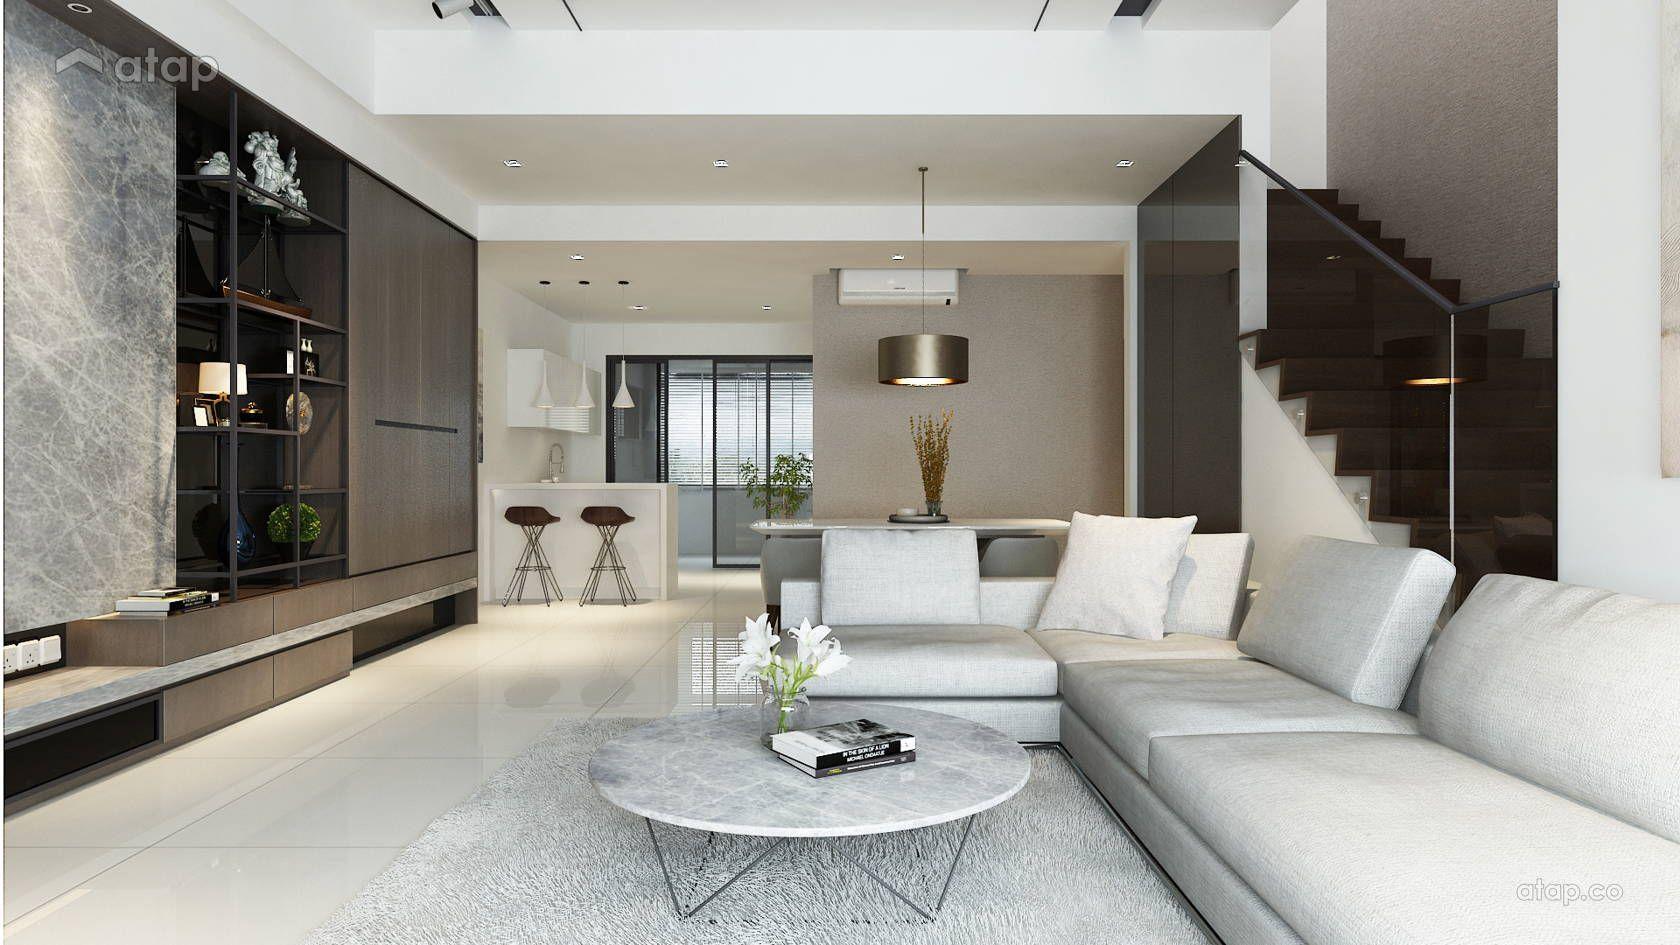 Bandar Puteri Puchong interior design renovation ideas